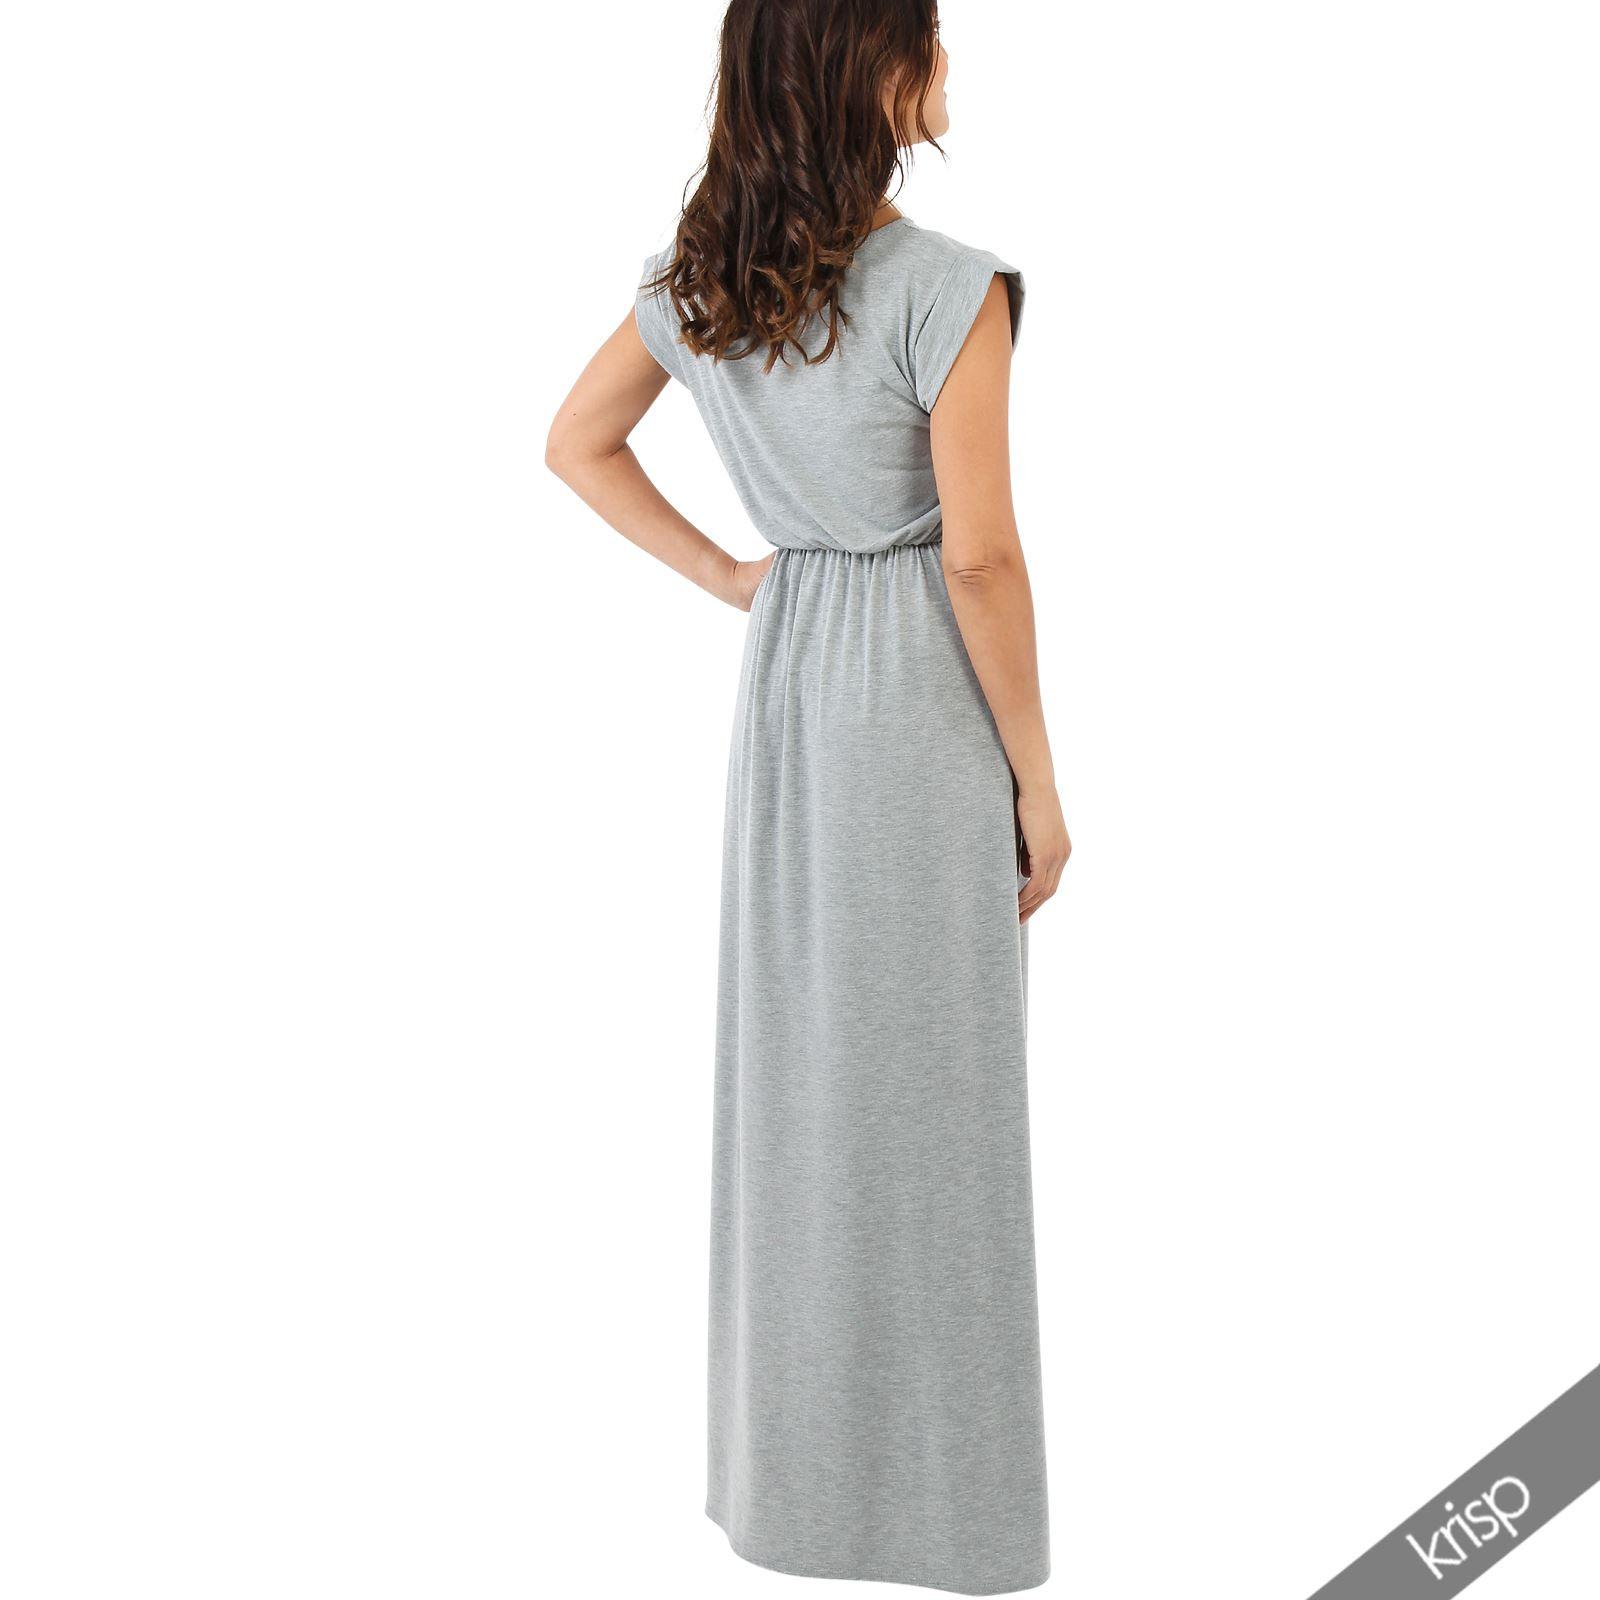 Baby online long summer dresses with short sleeves runway urban